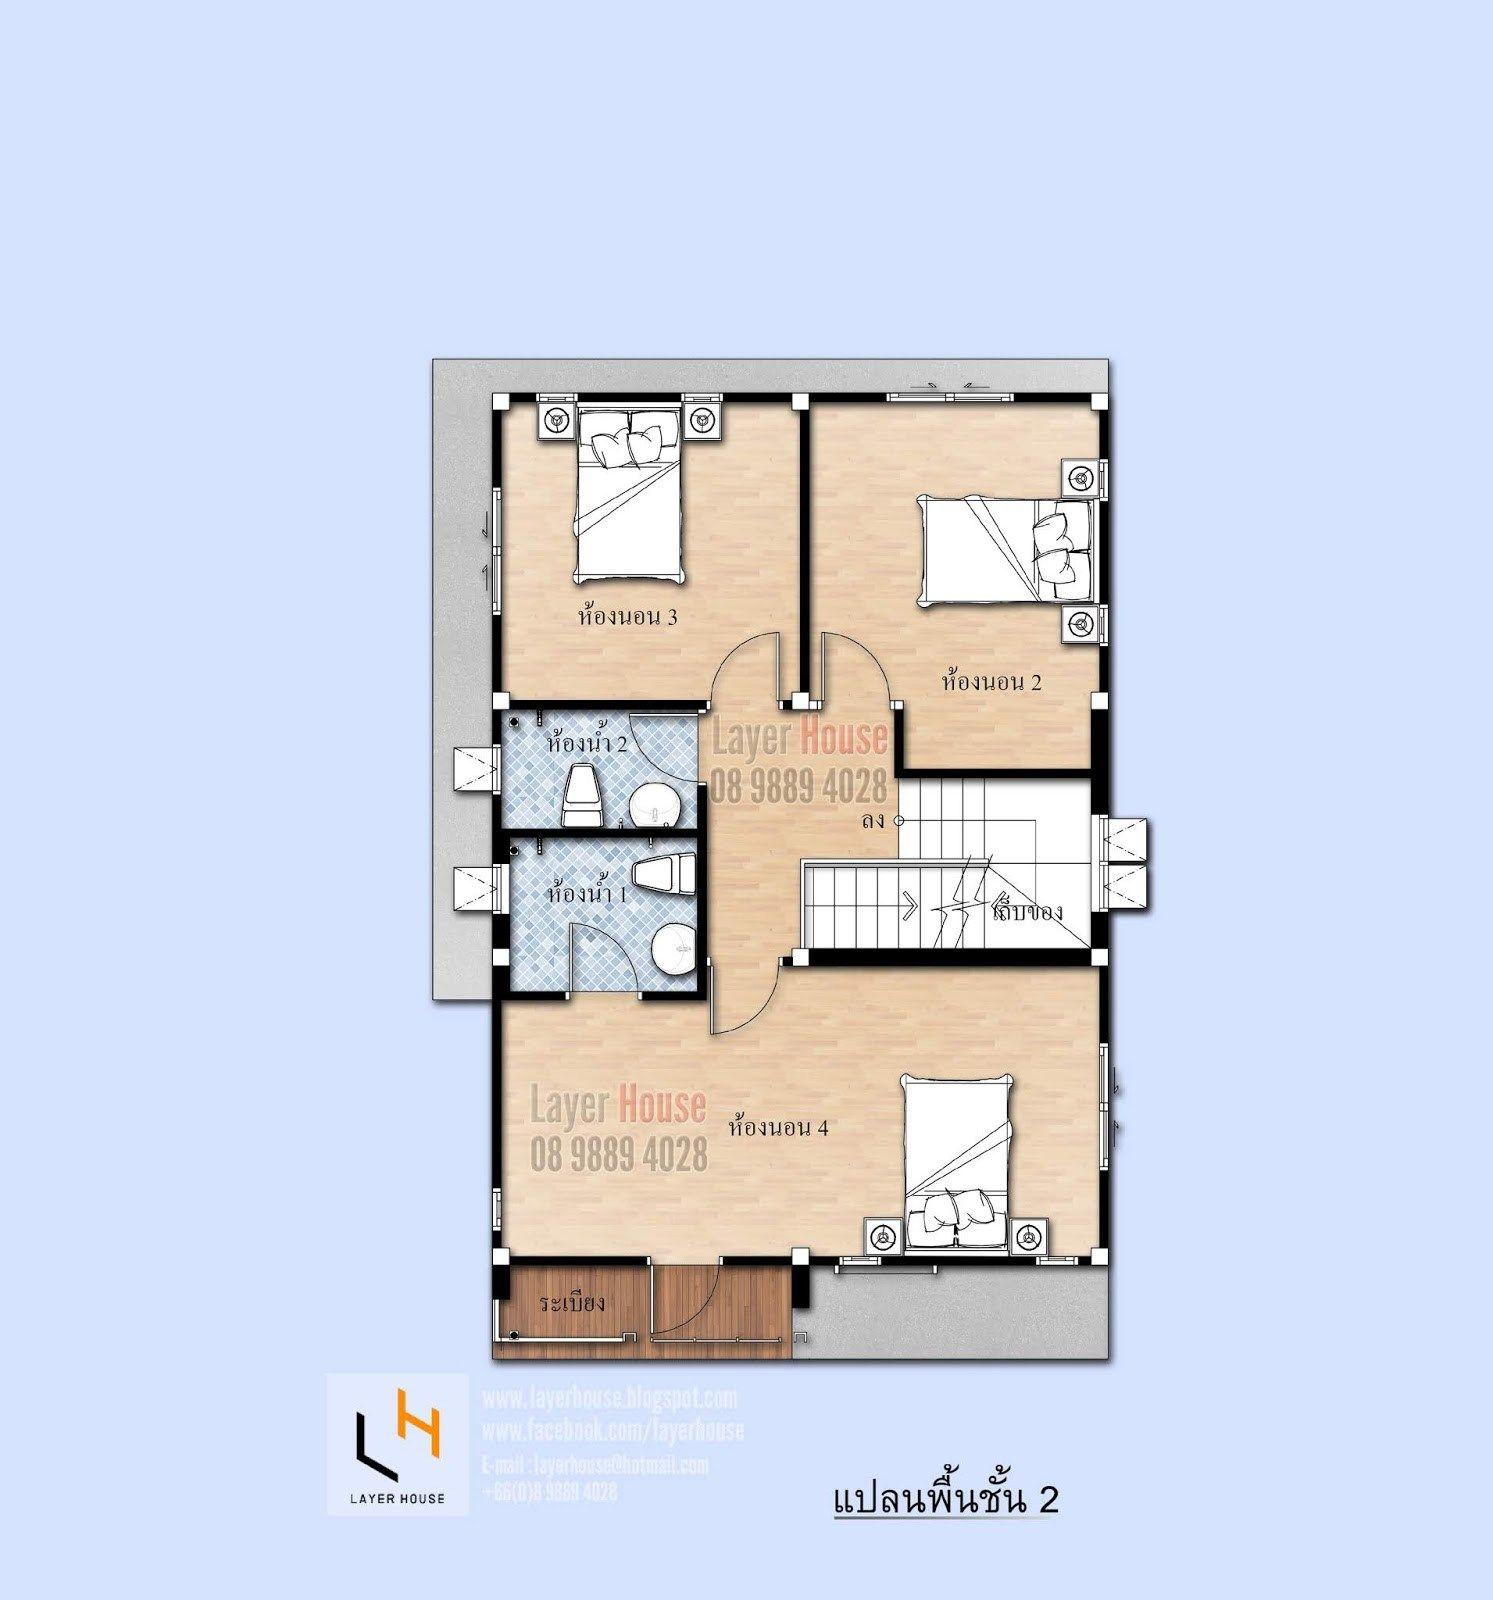 House Plans Idea 7x11 M With 4 Bedrooms Sam House Plans In 2020 House Plan Gallery House Plans Two Storey House Plans